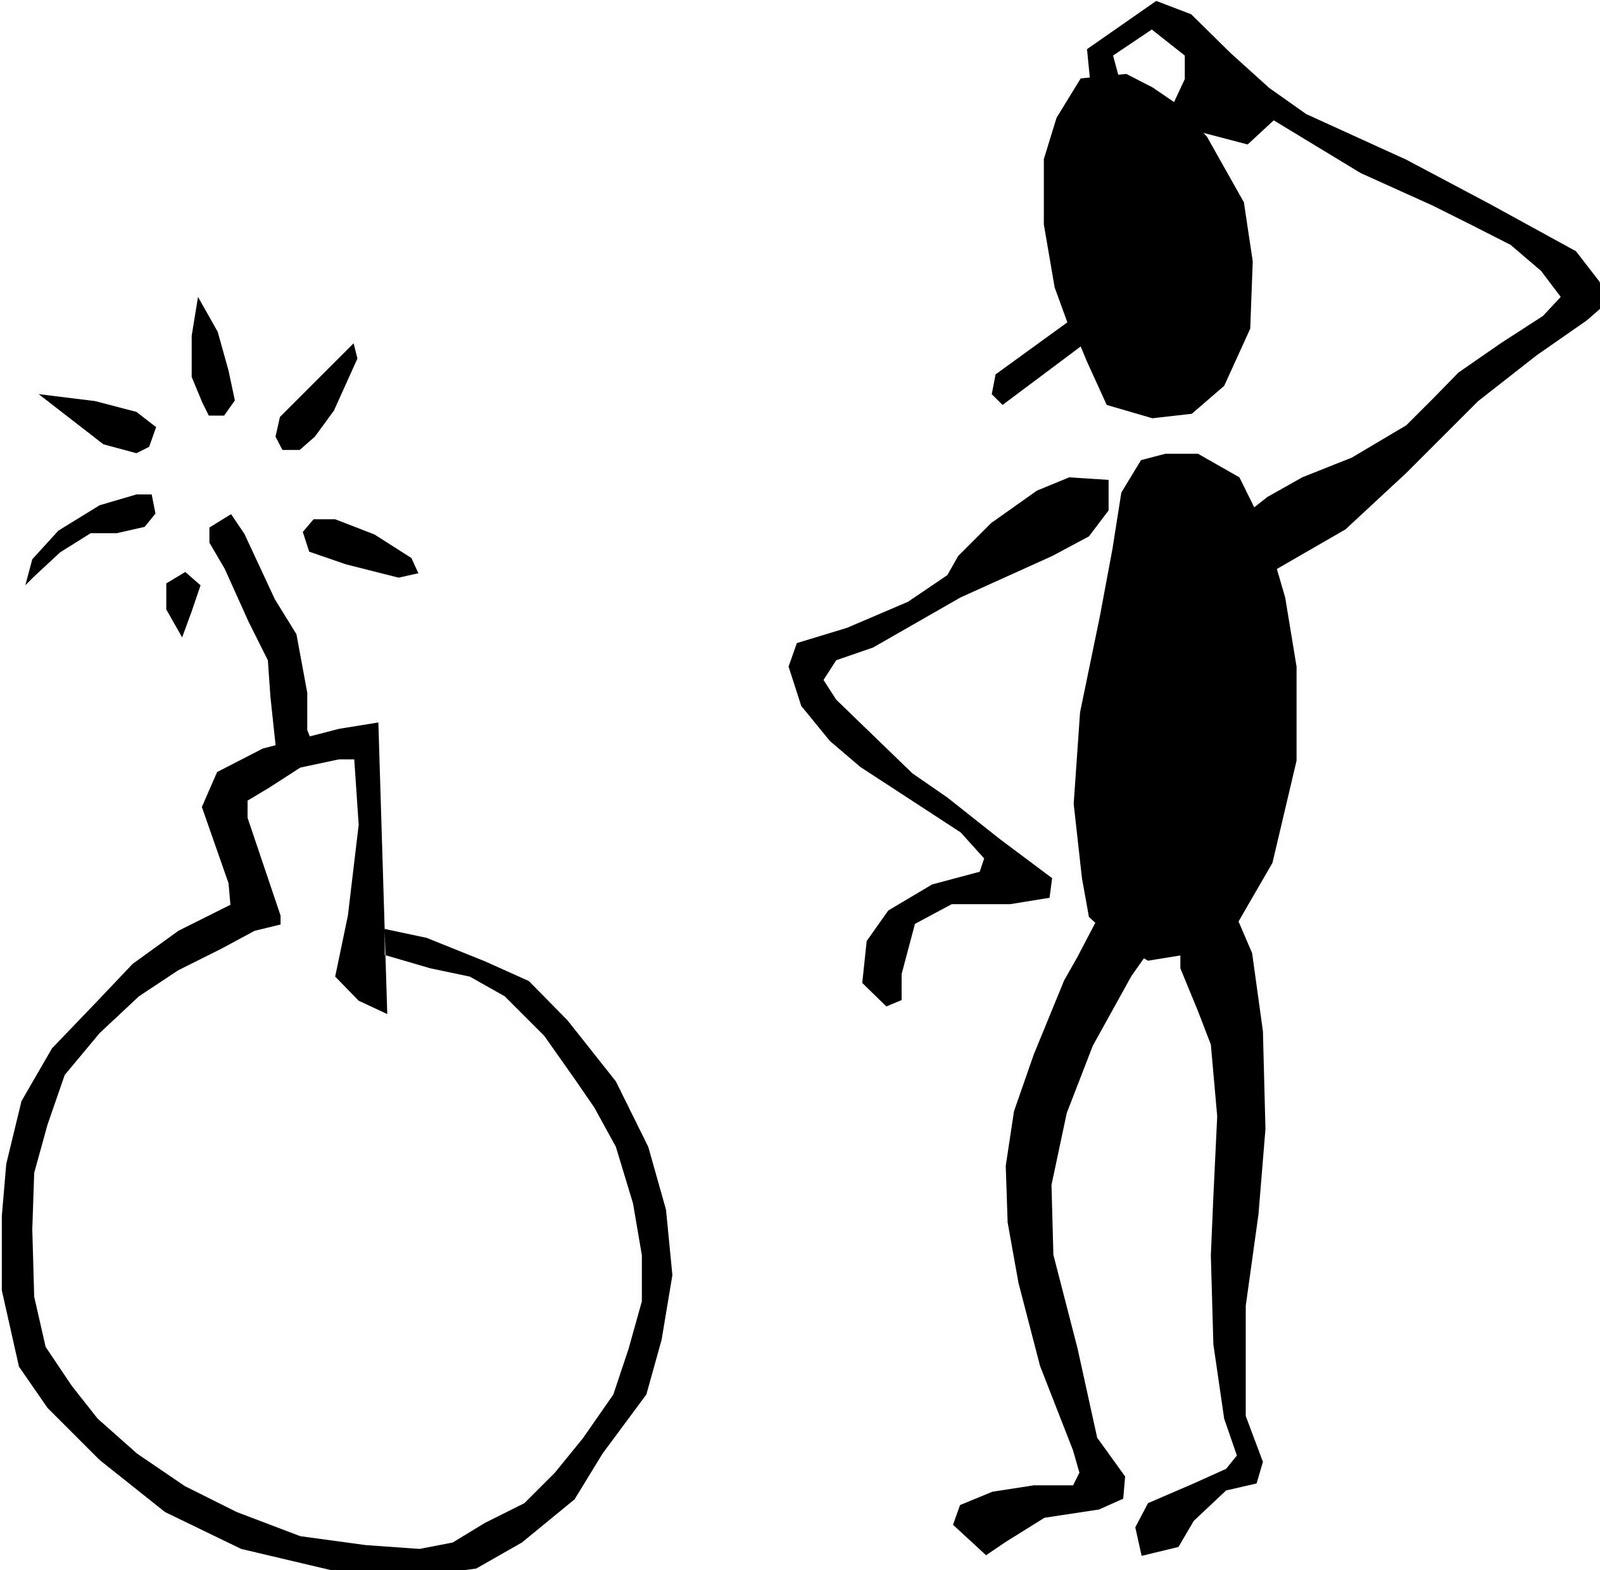 1600x1570 Thinking Stick Figure Clipart Clipartix